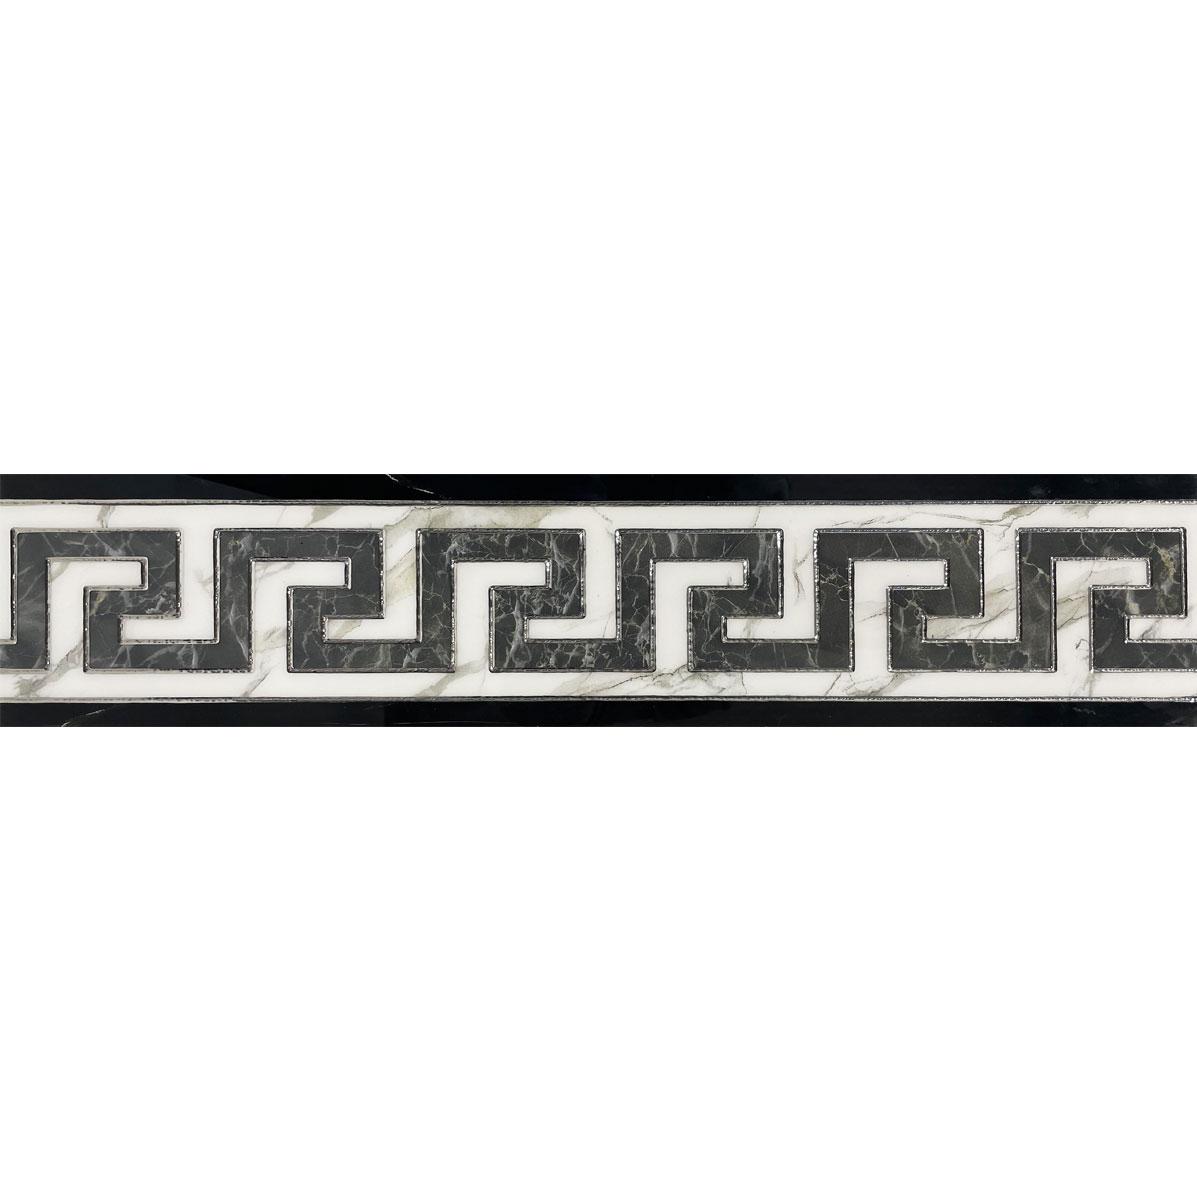 HALLMARK BORDER L00028 6X24 WHITE GREY BLACK